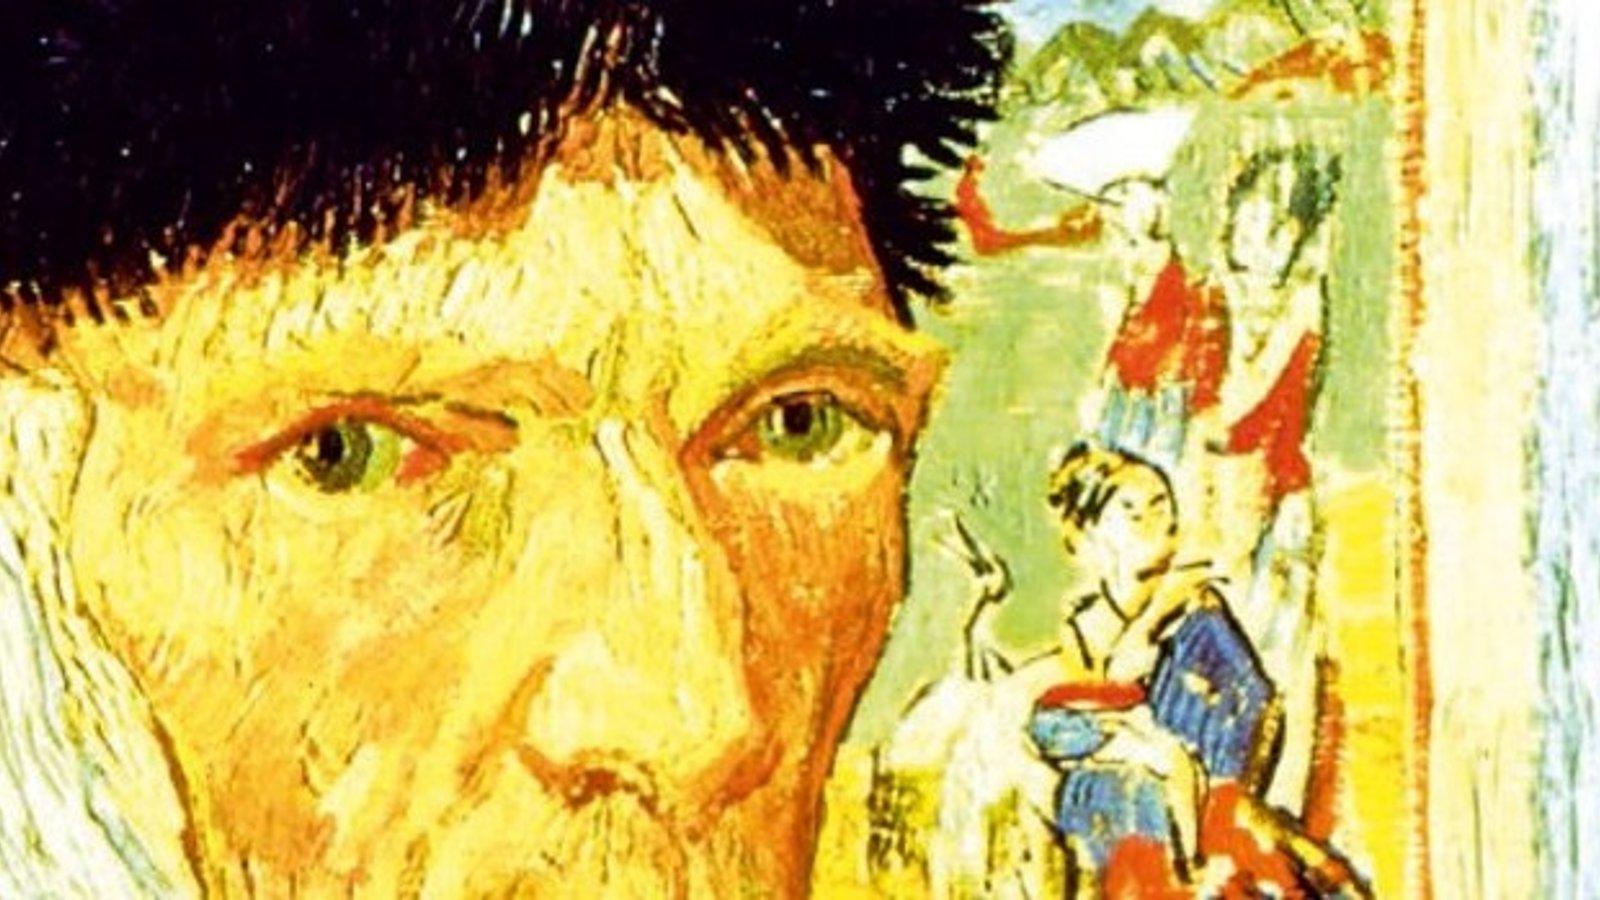 Vincent Van Gogh: A Life Devoted to Art